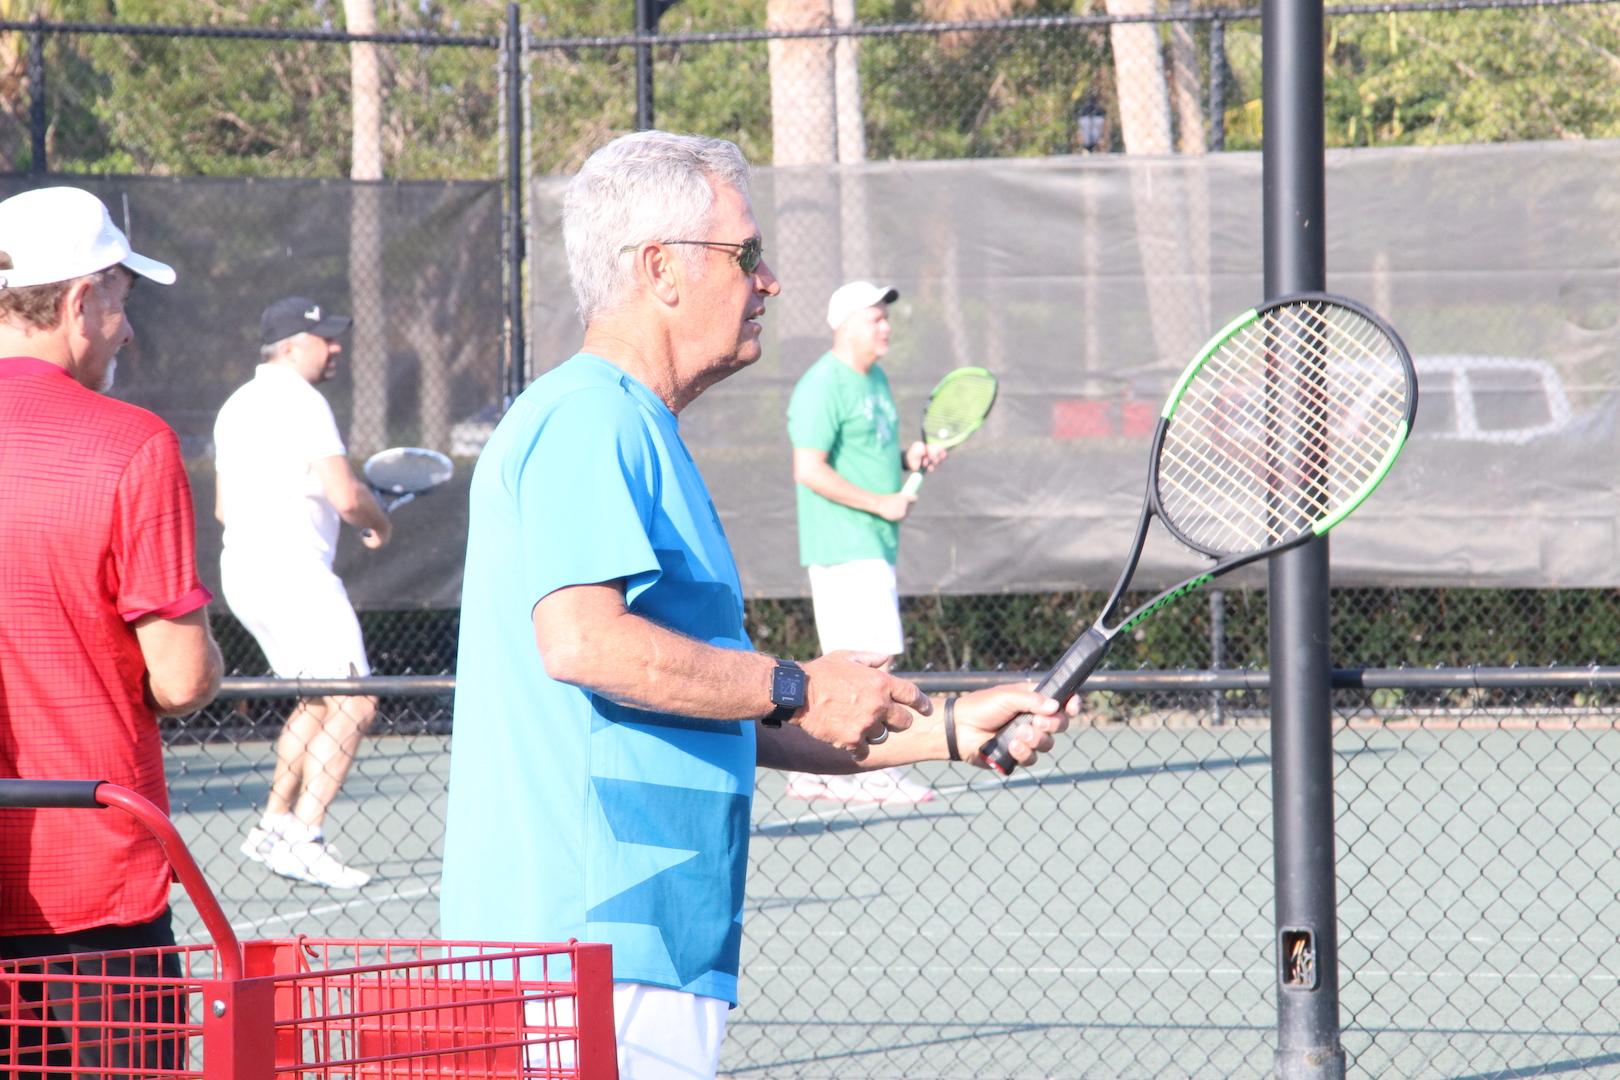 tennis-Gully3.JPG